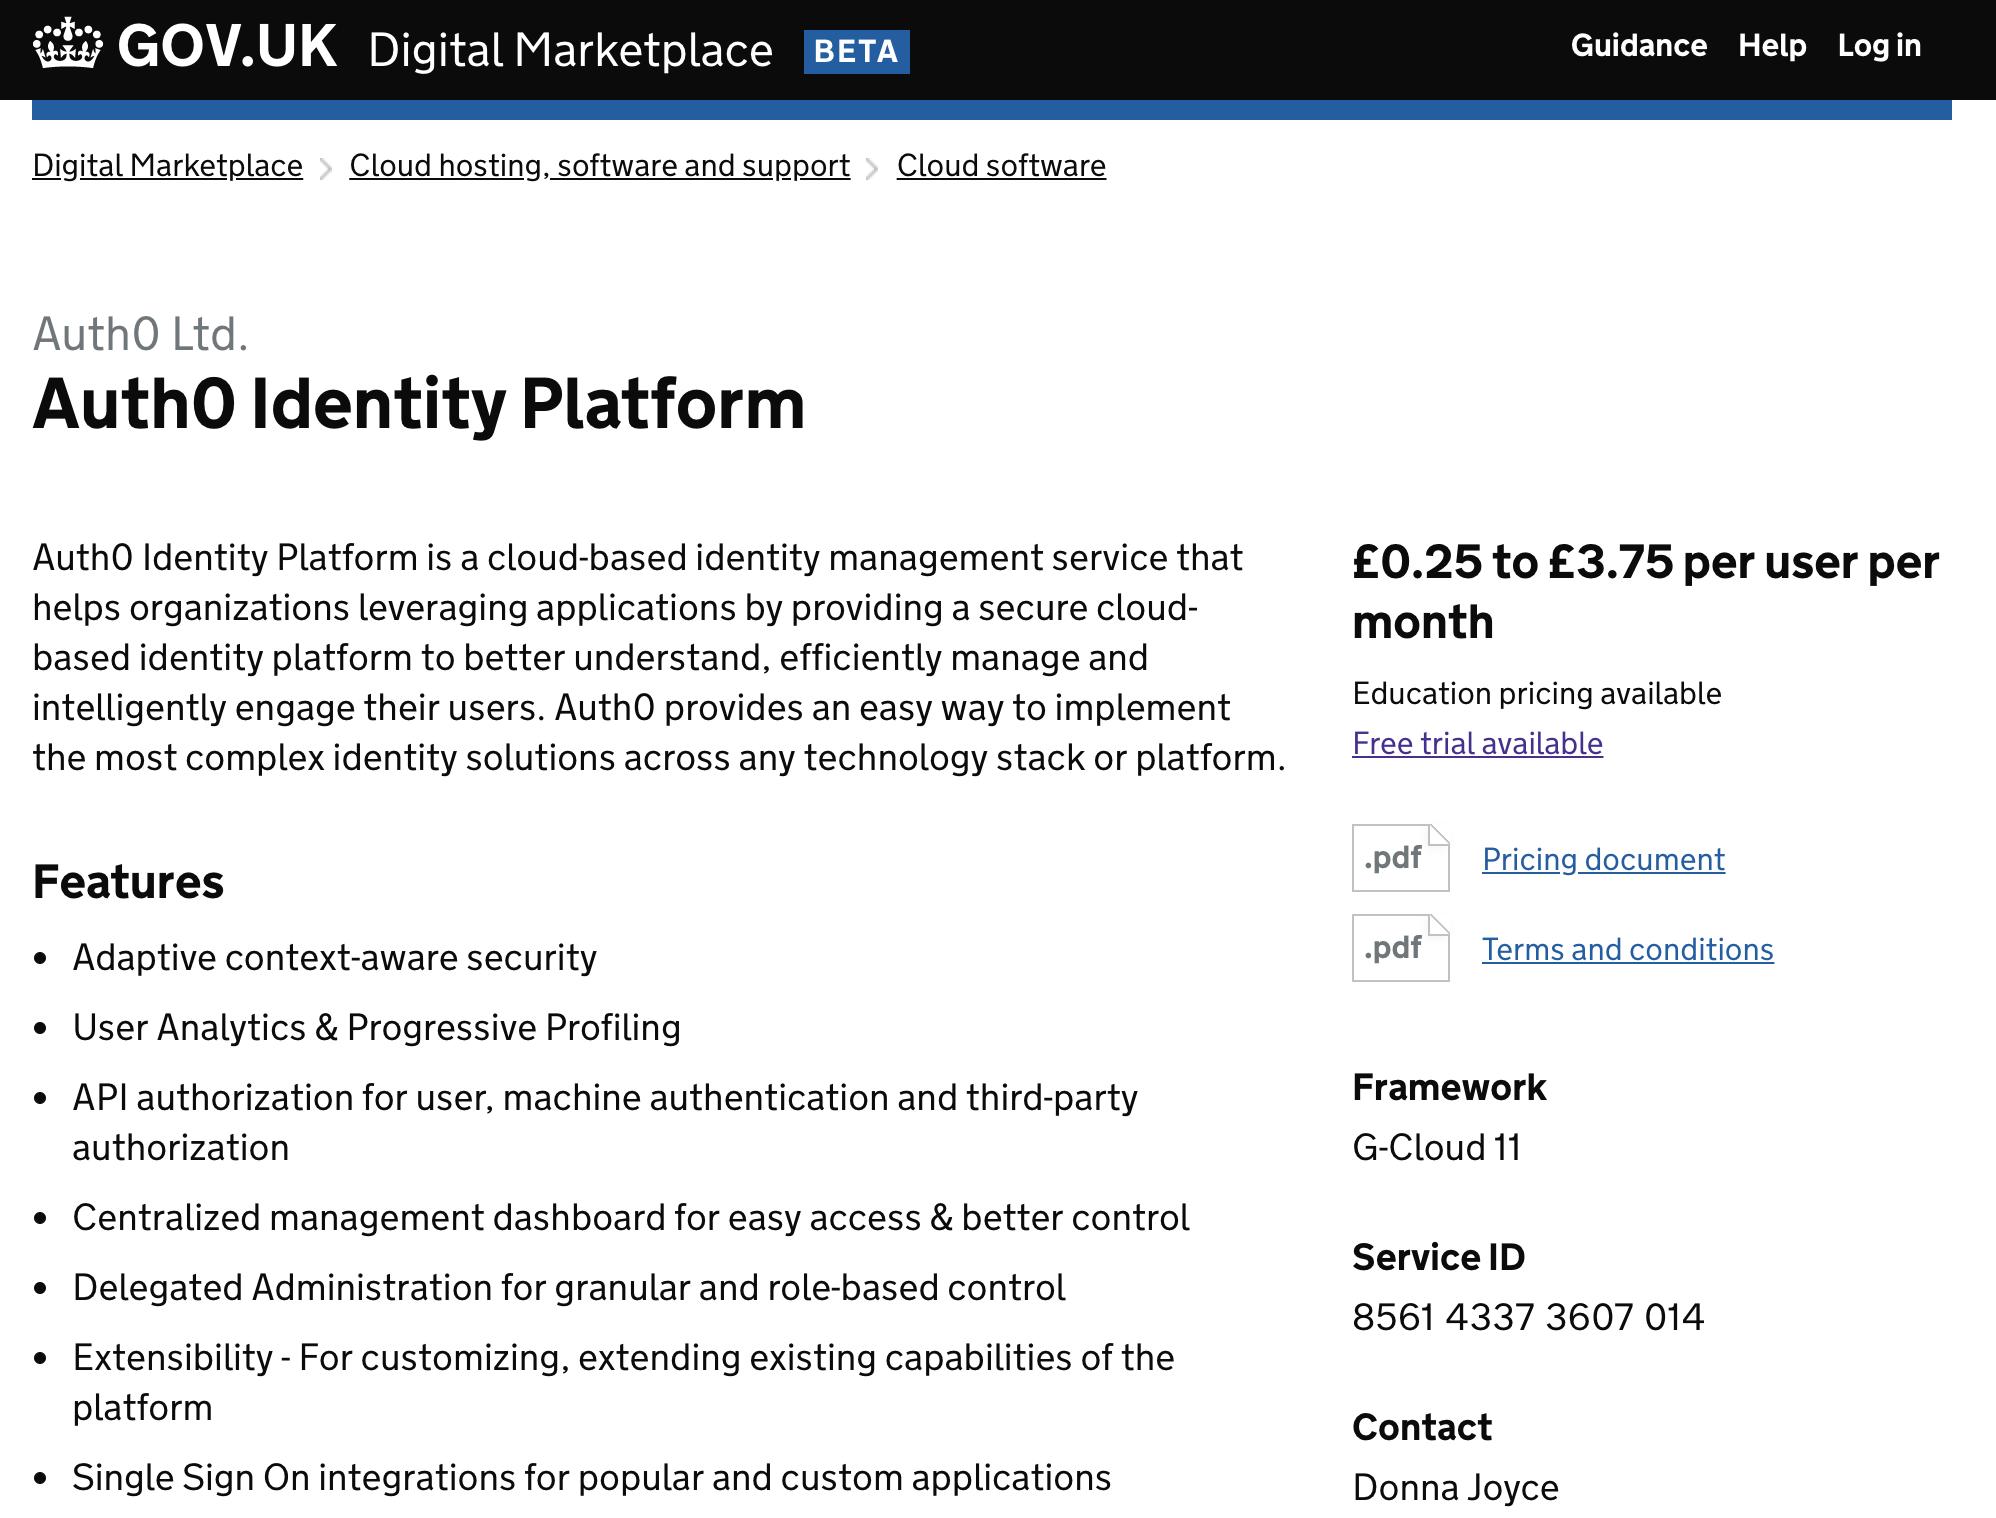 Auth0 listed in UK gov.uk site Digital Marketplace